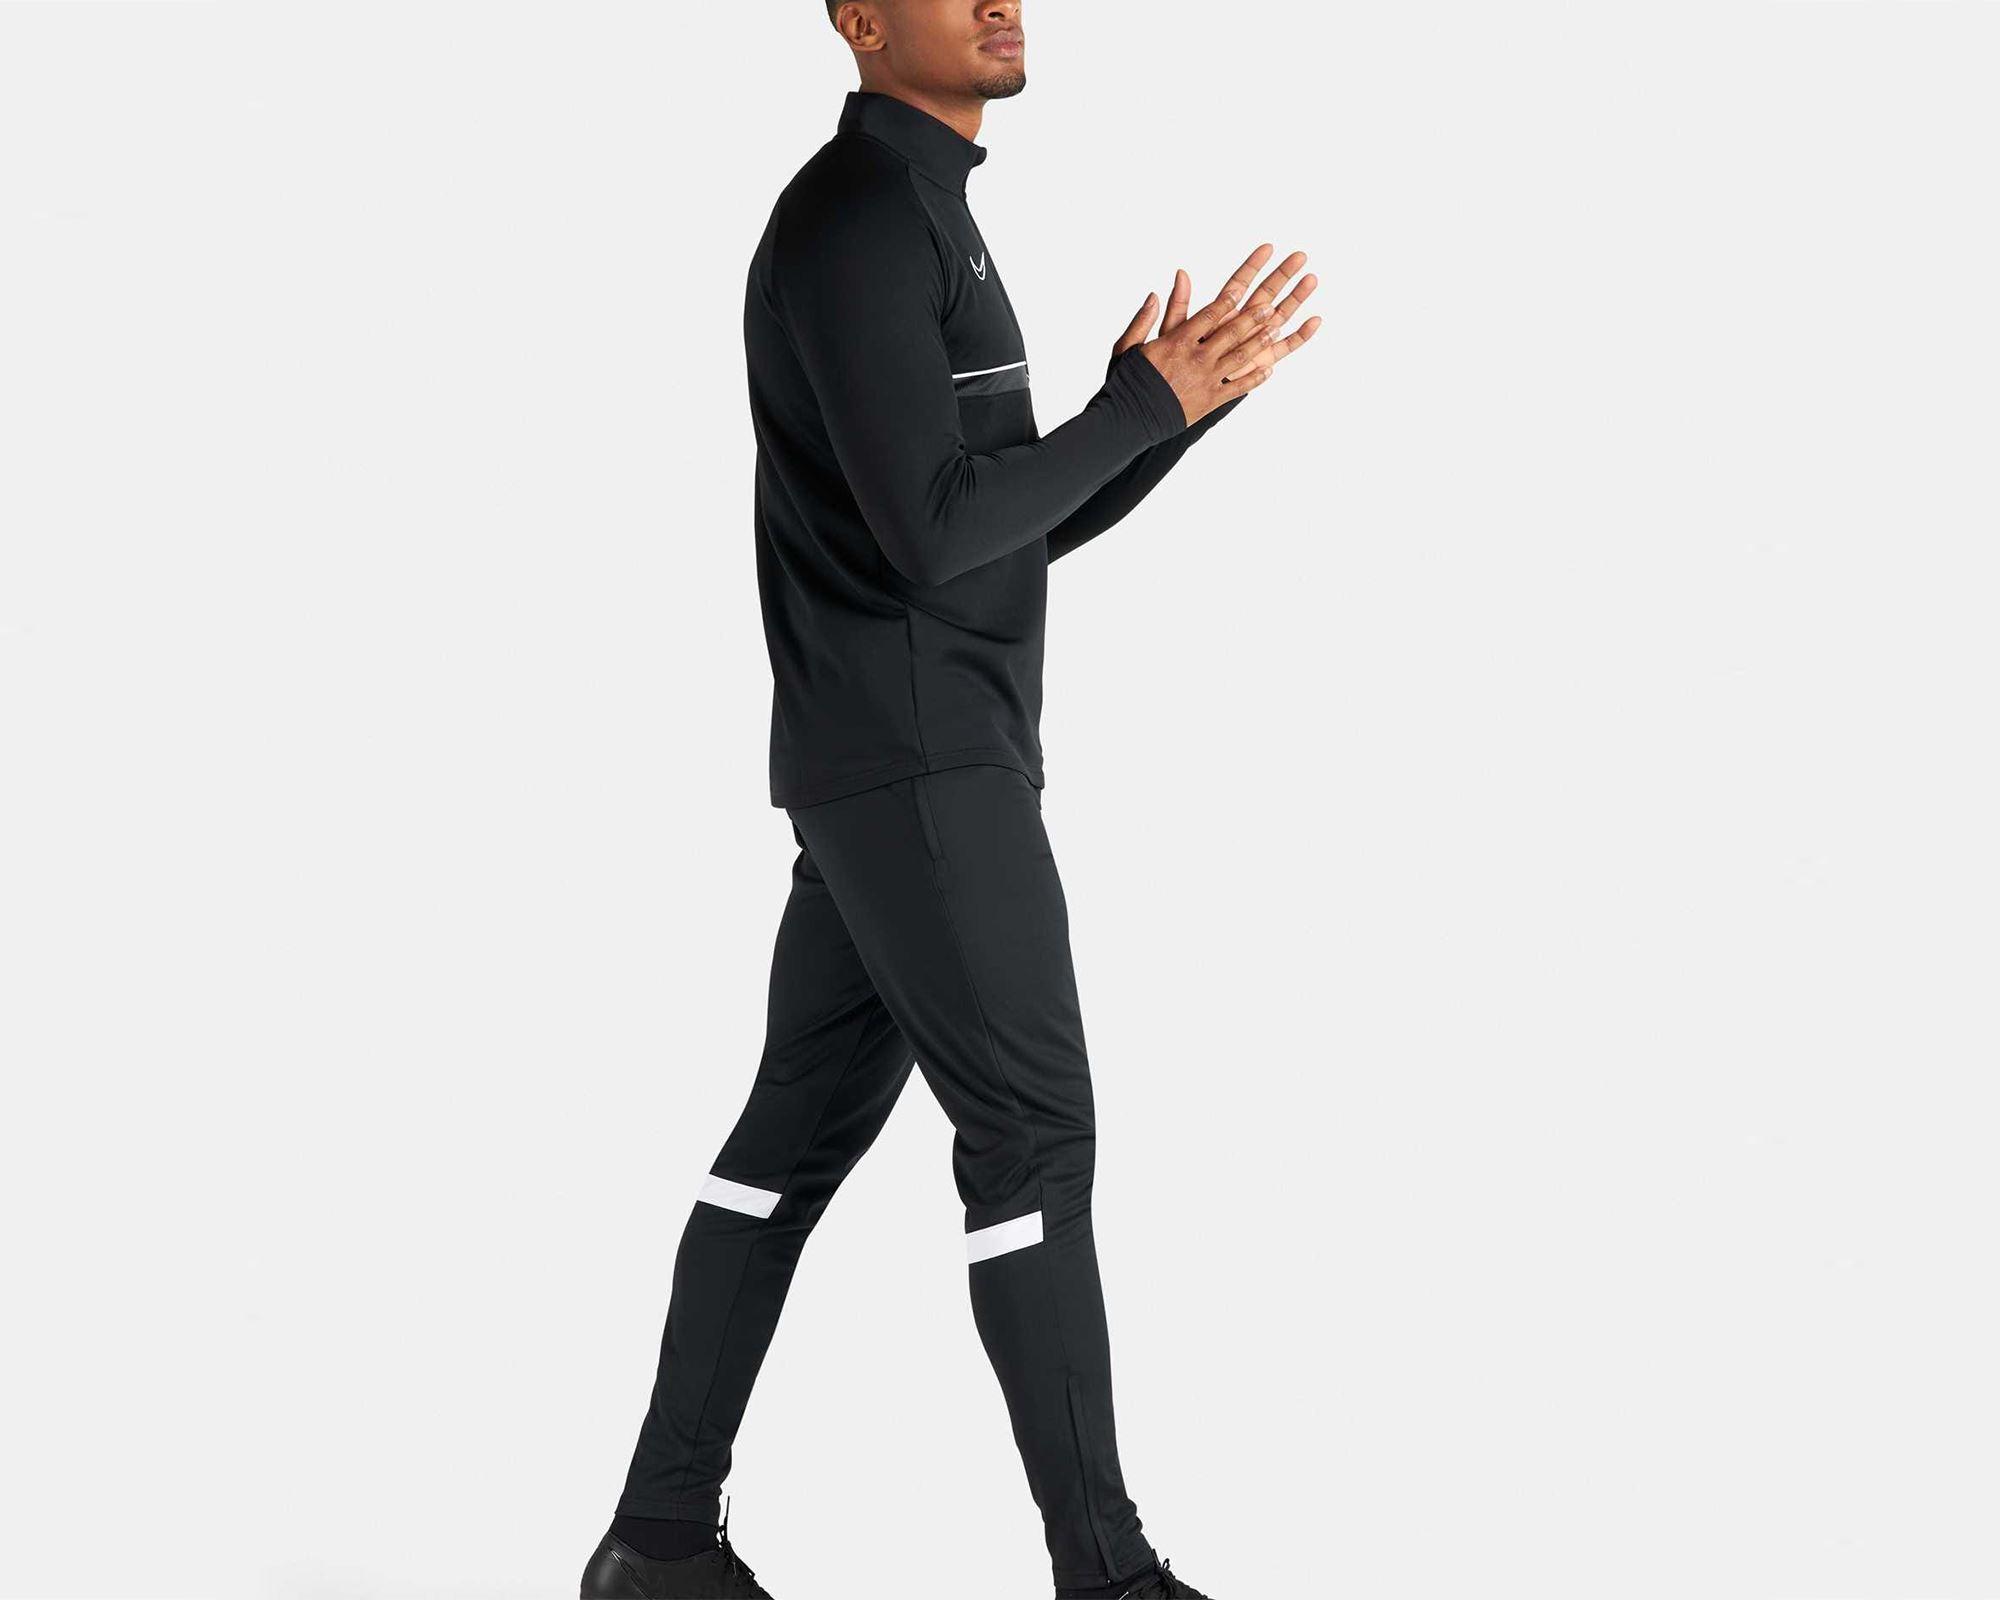 Dri-Fit Academy Soccer Erkek Siyah Eşofman Altı (CW6122-010)